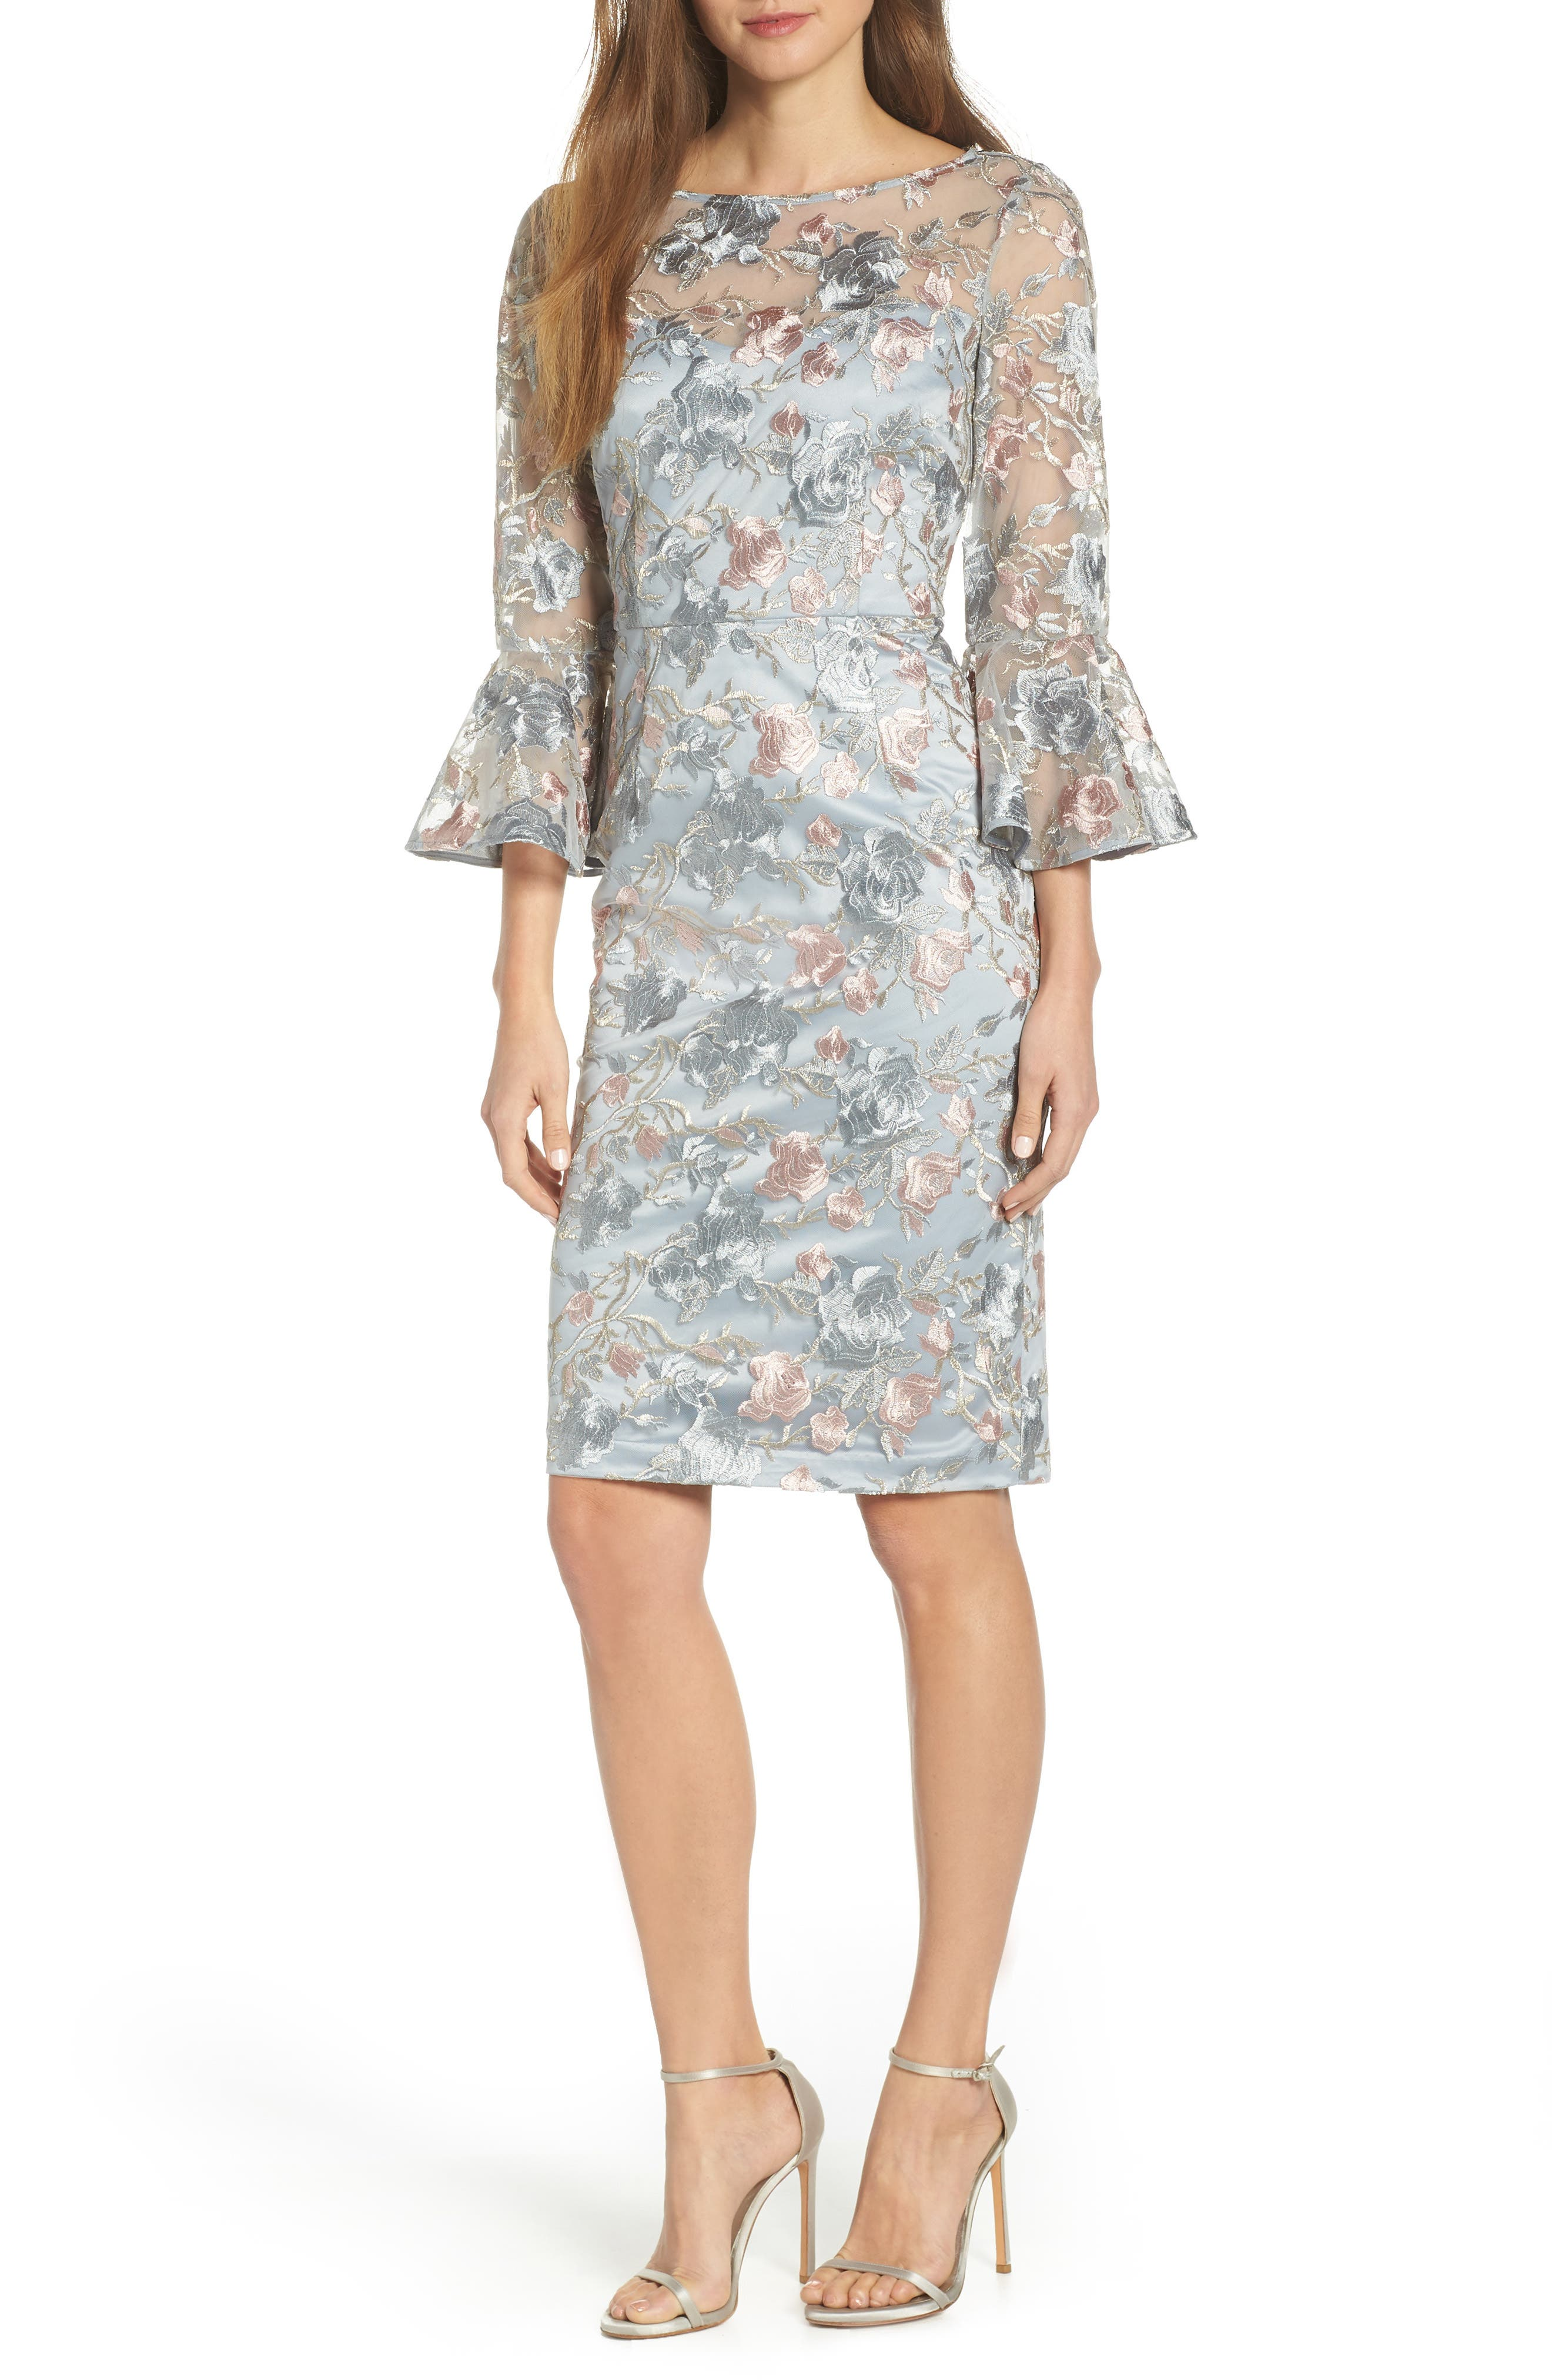 ELIZA J Floral Embroidered Sheath Dress, Main, color, 421